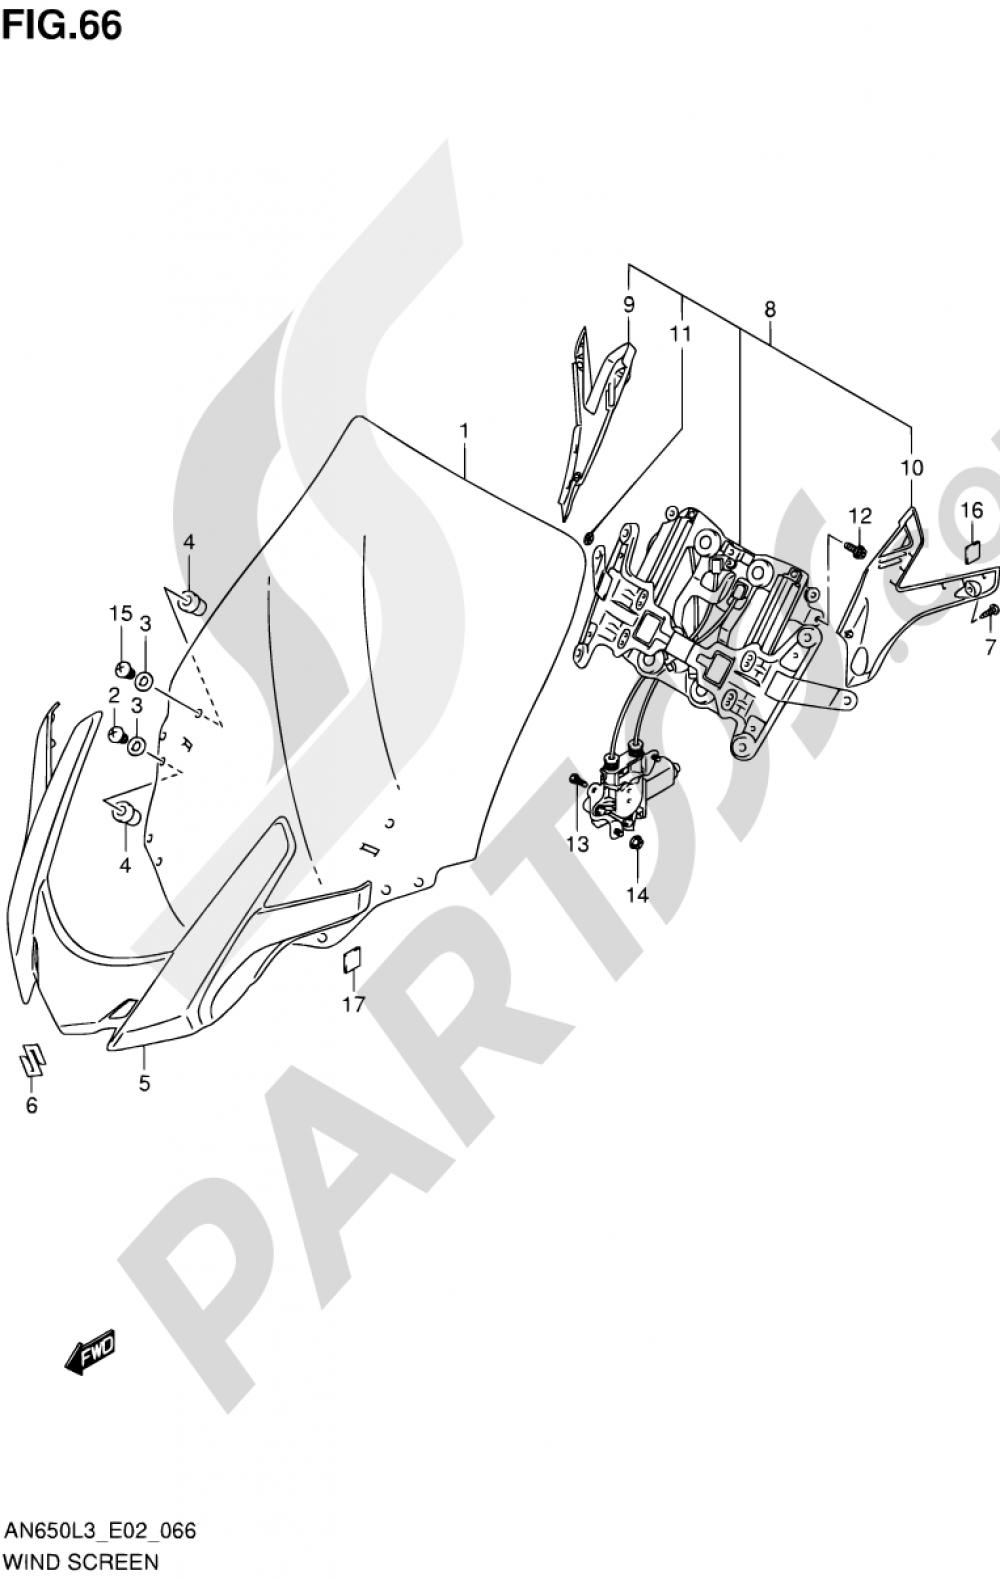 66 - WIND SCREEN Suzuki BURGMAN AN650Z 2013